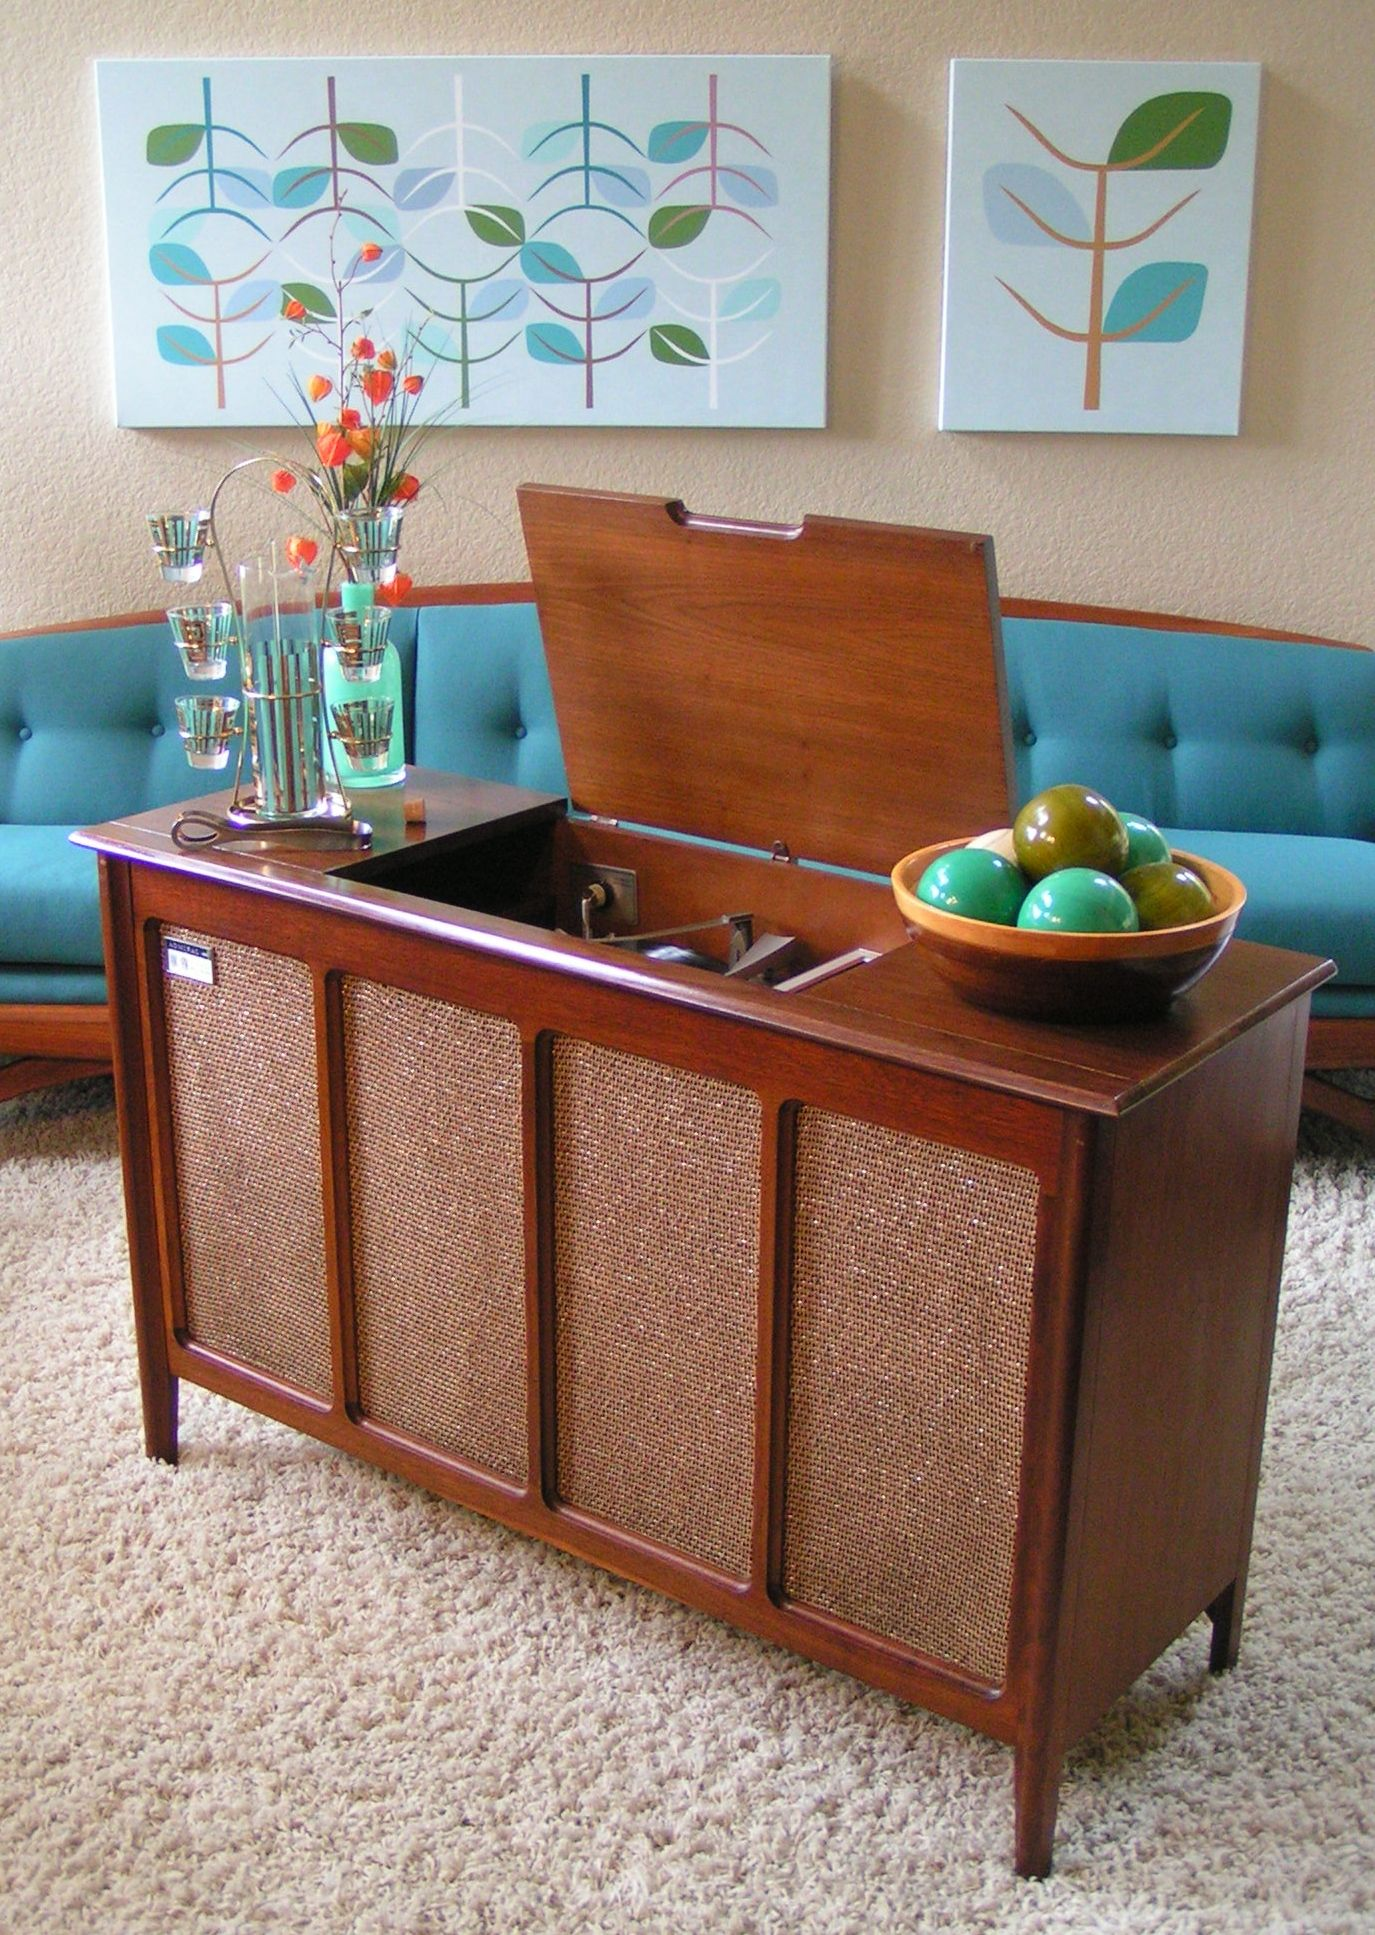 Cabinet Record Player Admiral Am Fm Multiplex Stereo Console 1963 Record Player